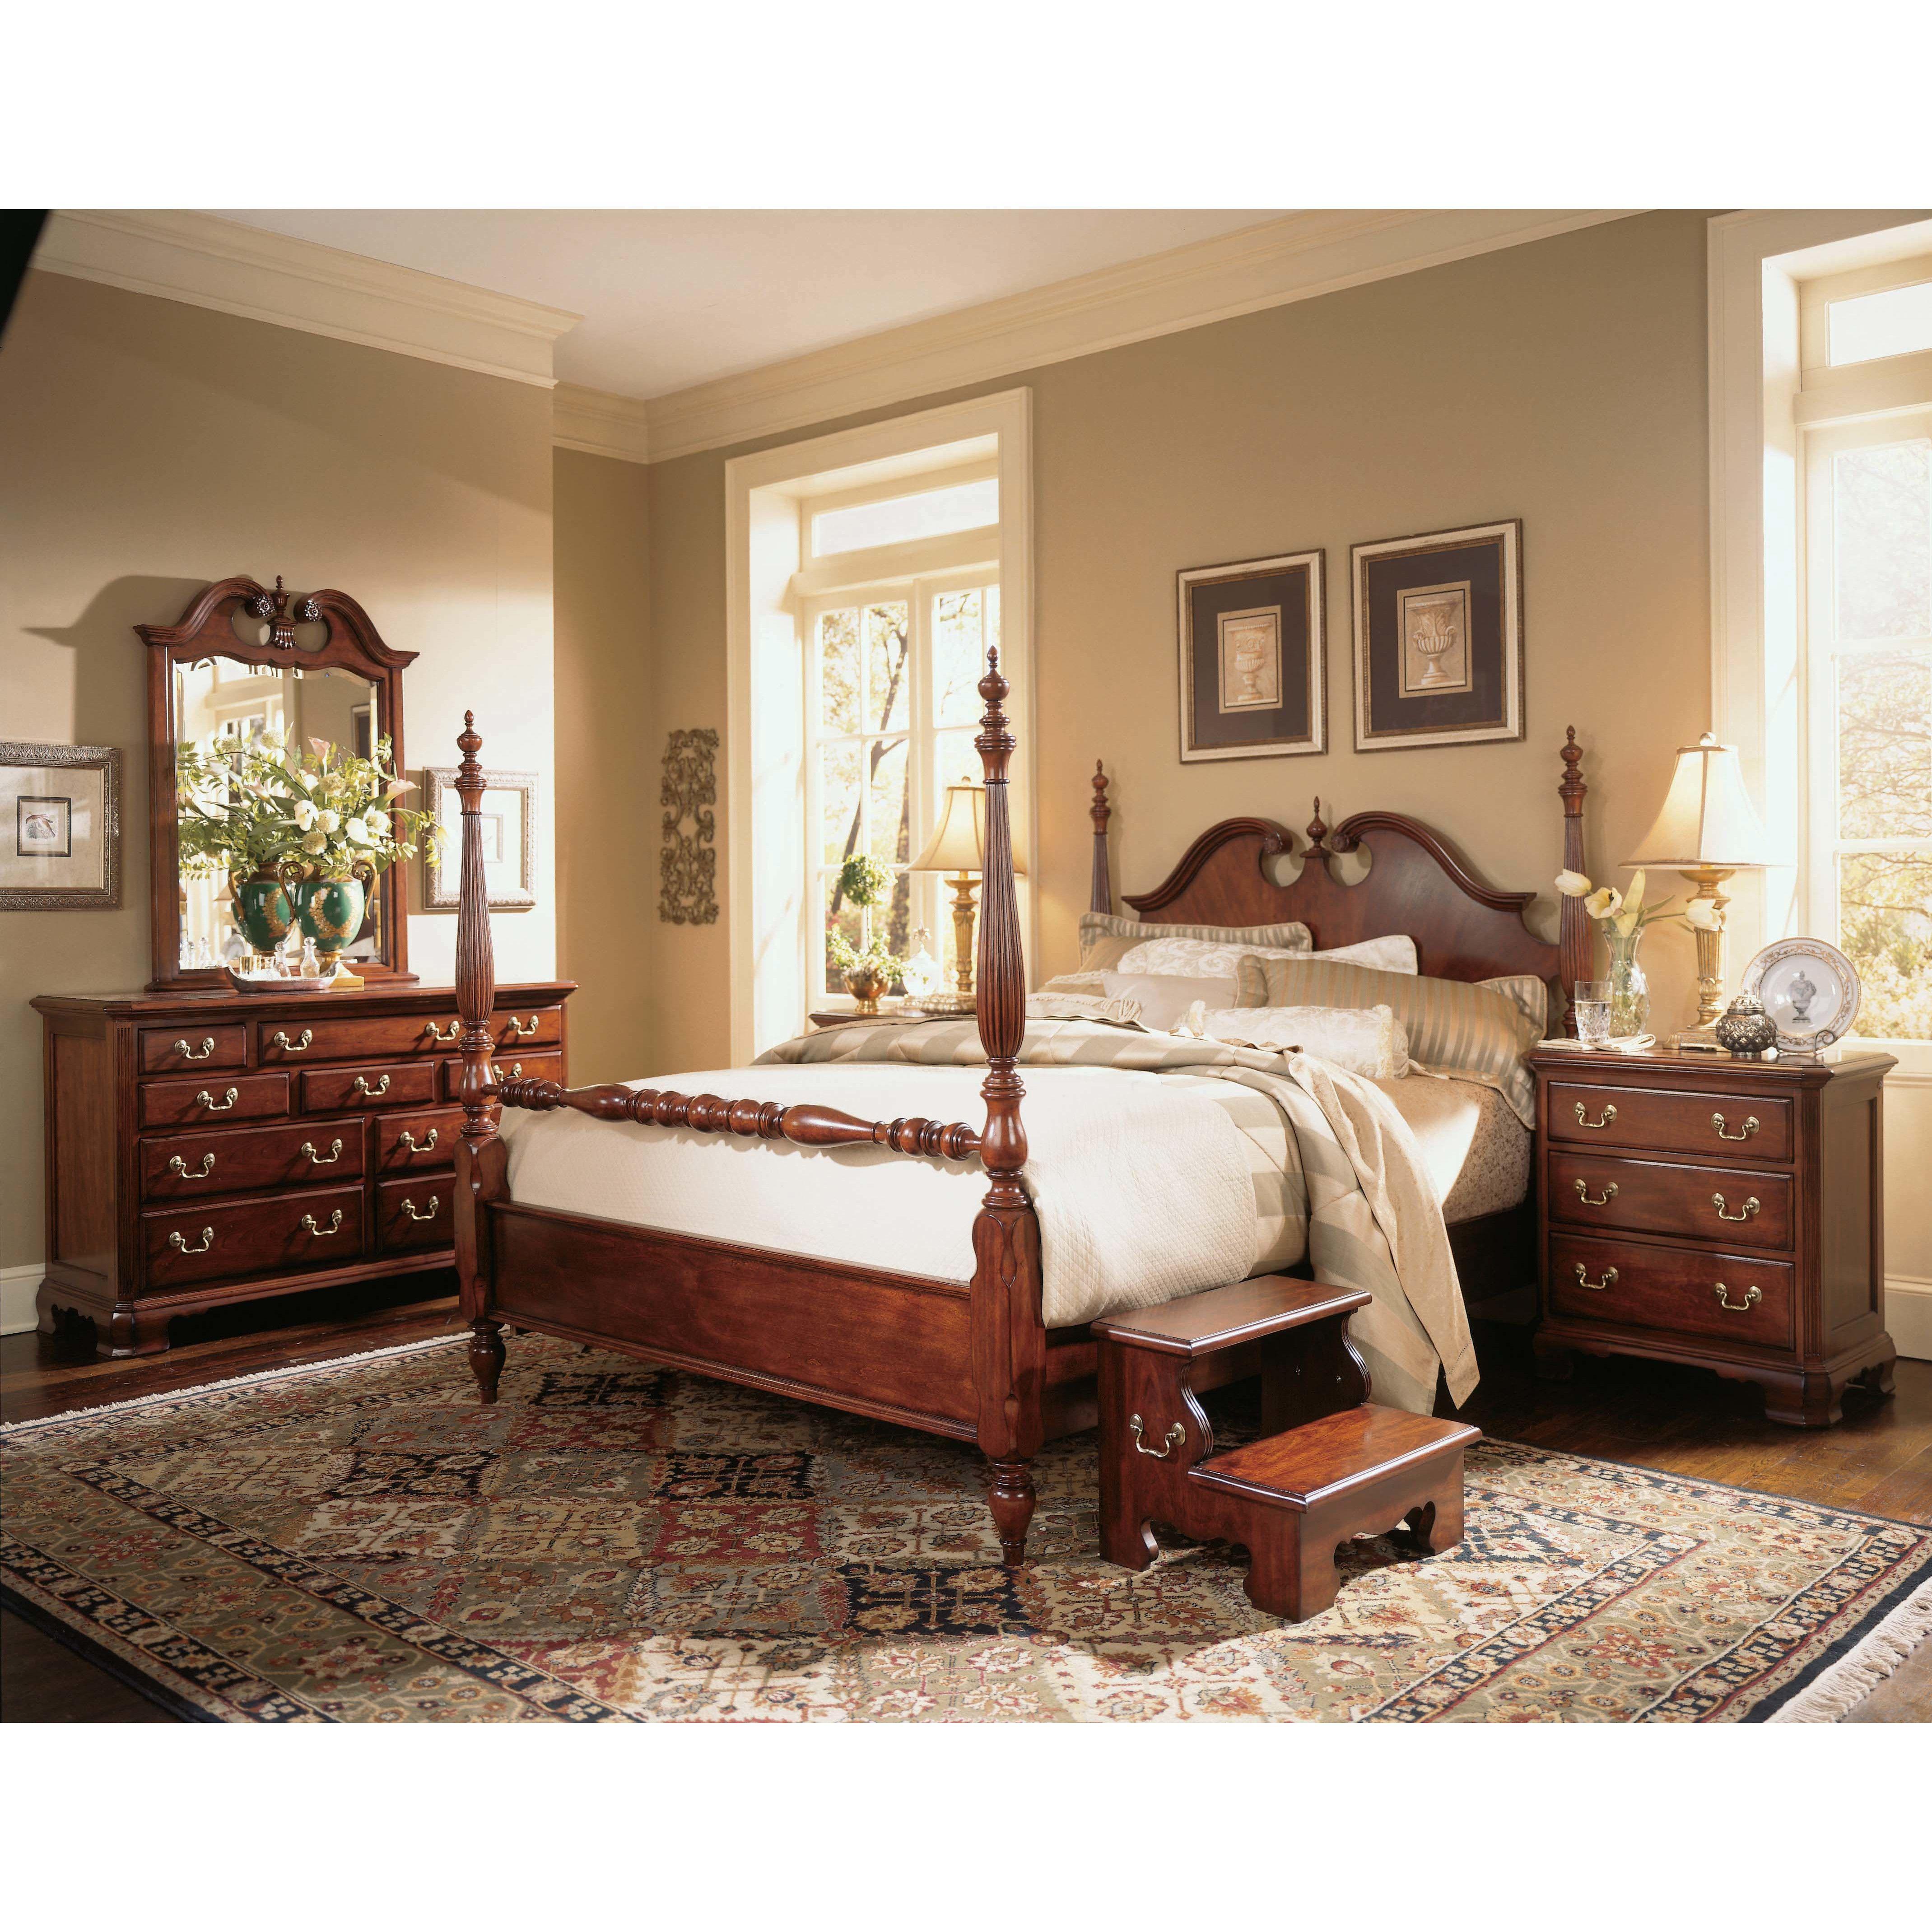 American Drew Cherry Grove Four Poster Customizable Bedroom Set